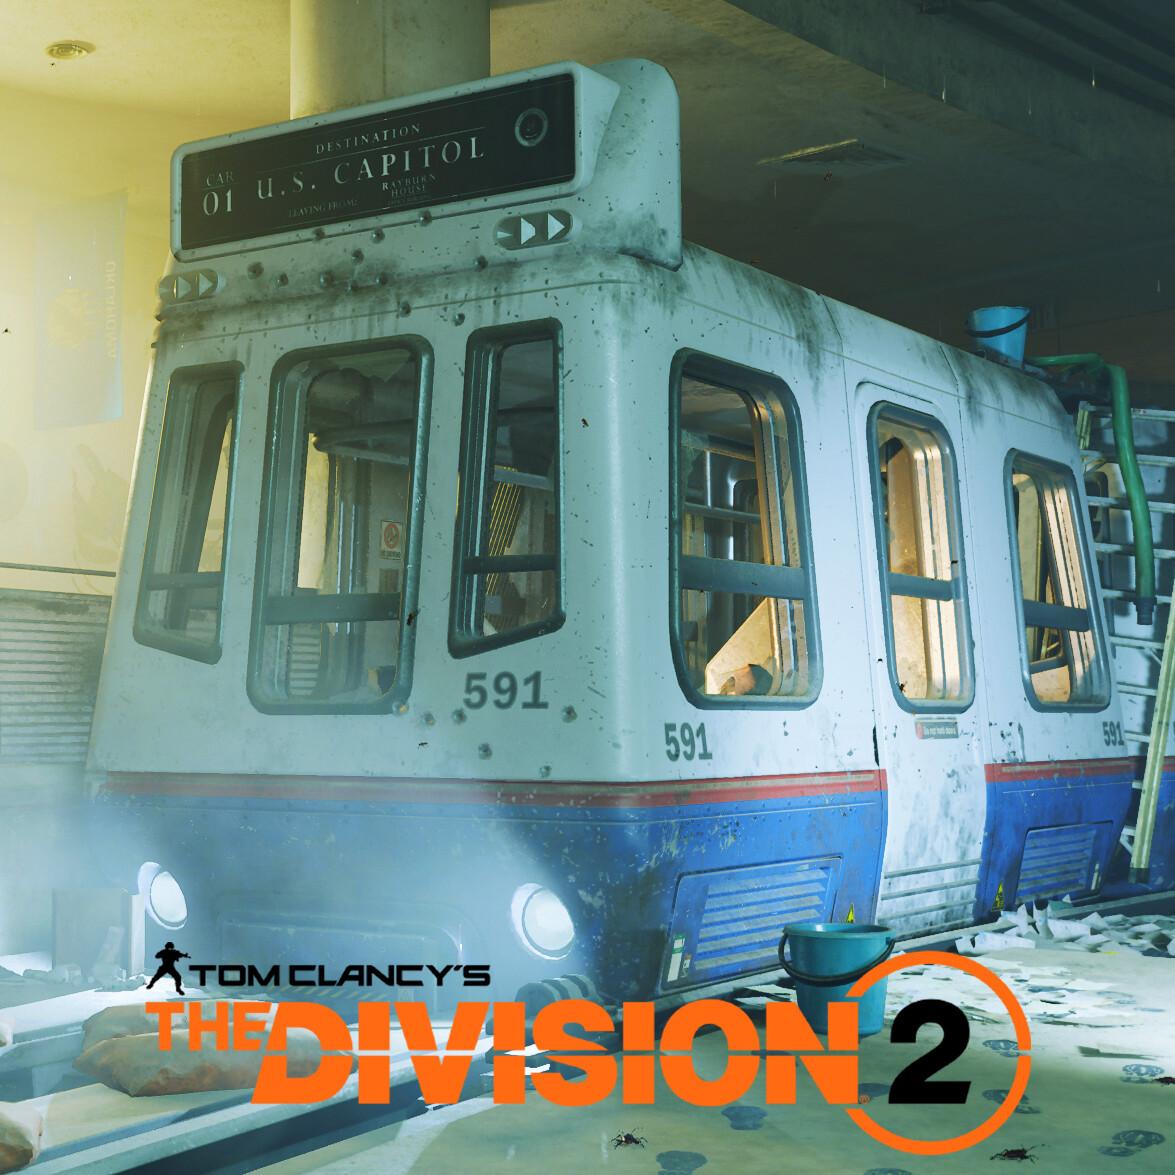 Tom Clancy's Division 2 Capitol Subway Car